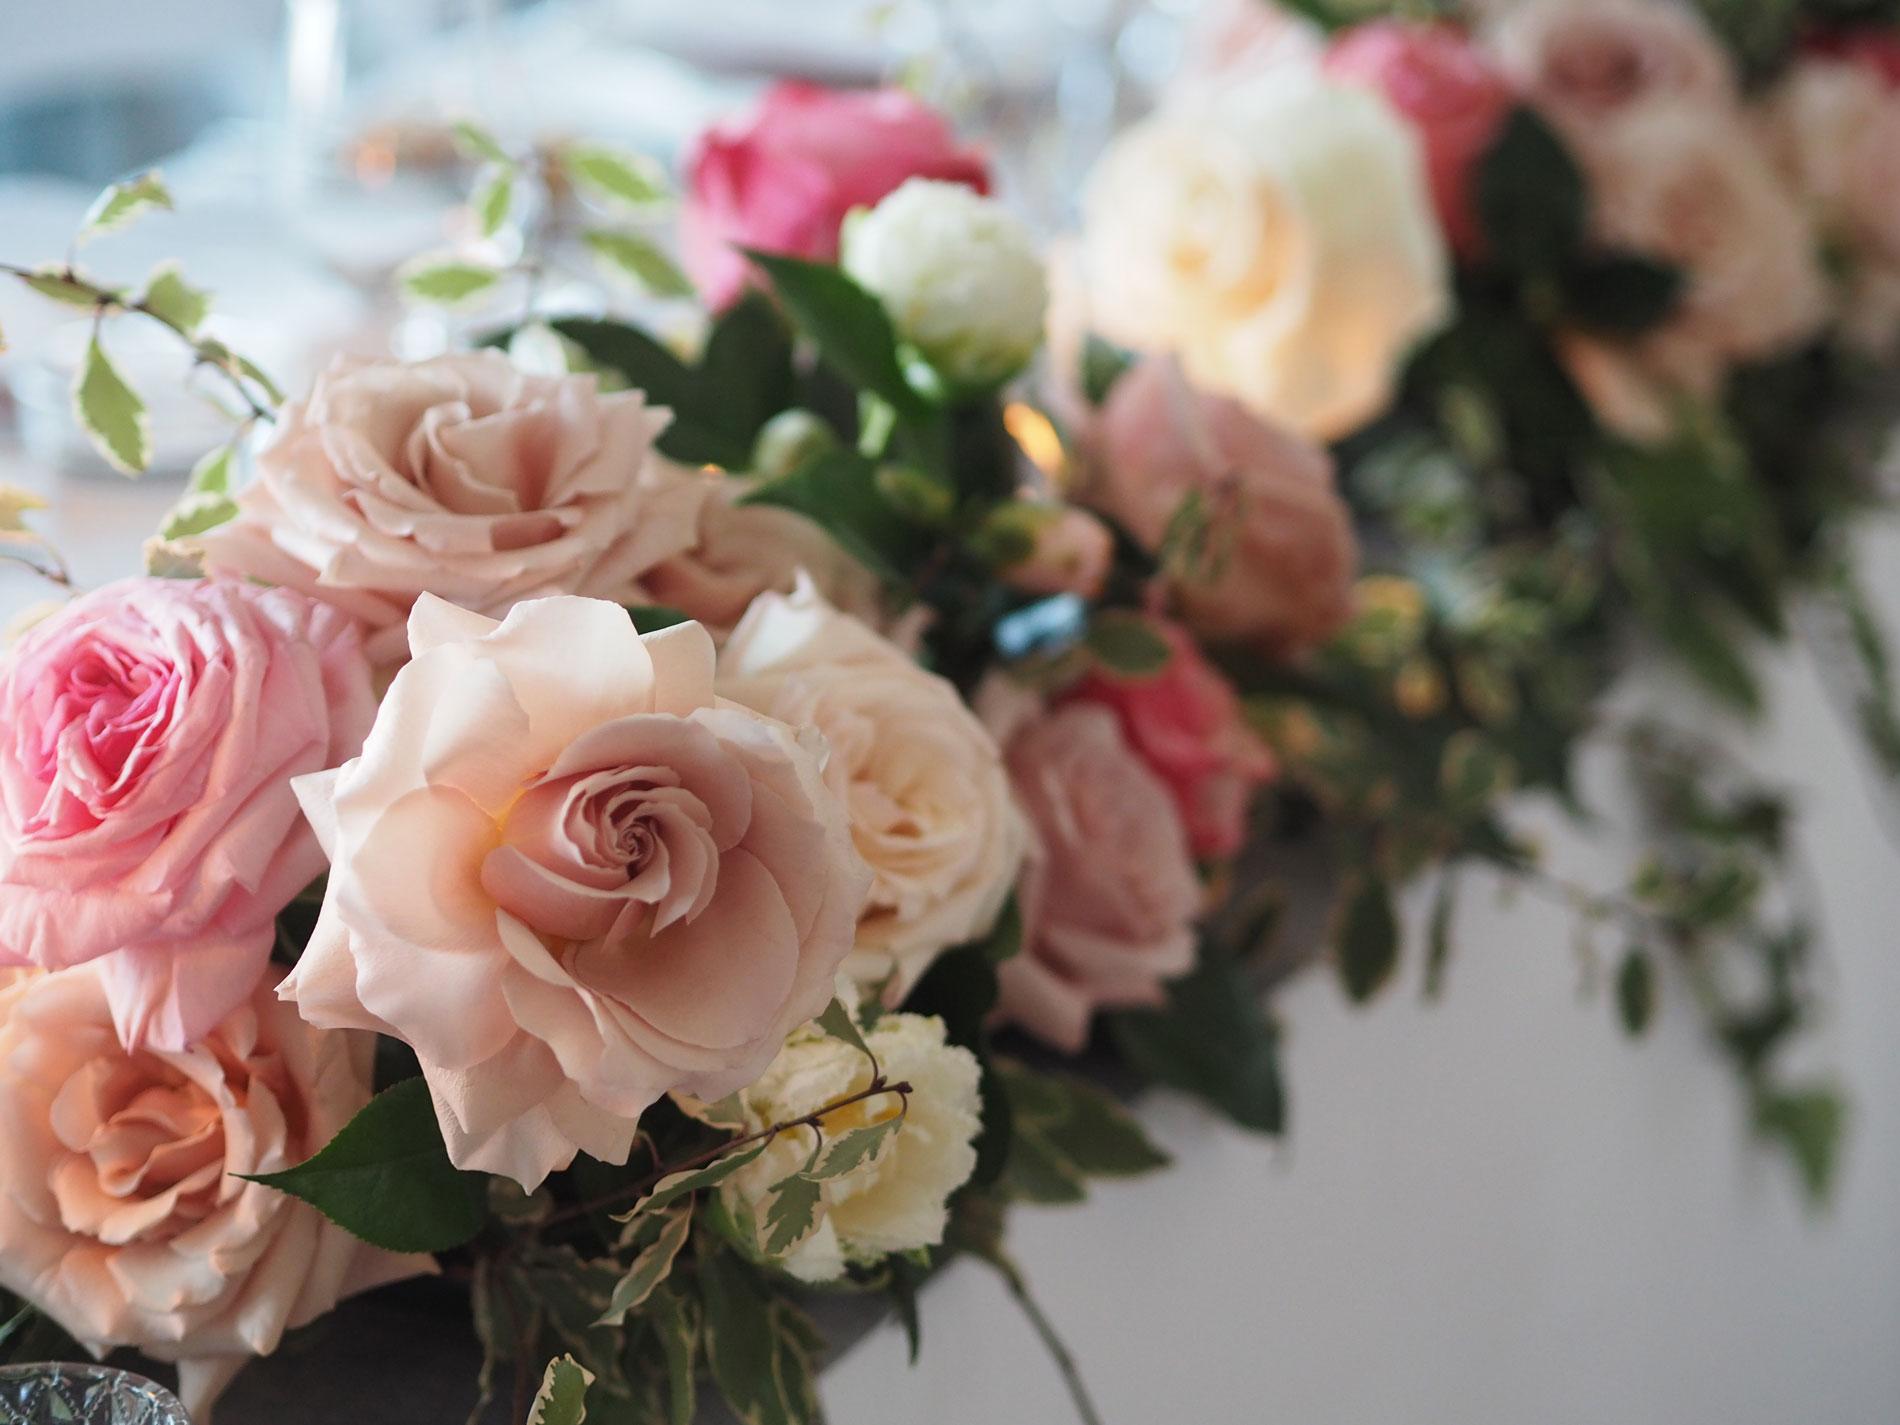 wedding_flowers_linda_antonio13.jpg